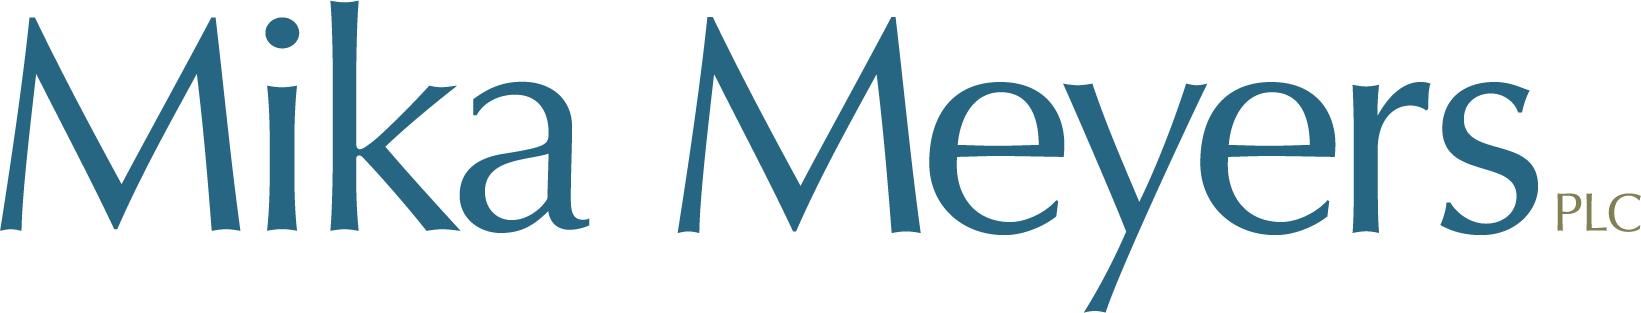 Mika Meyers logo.png